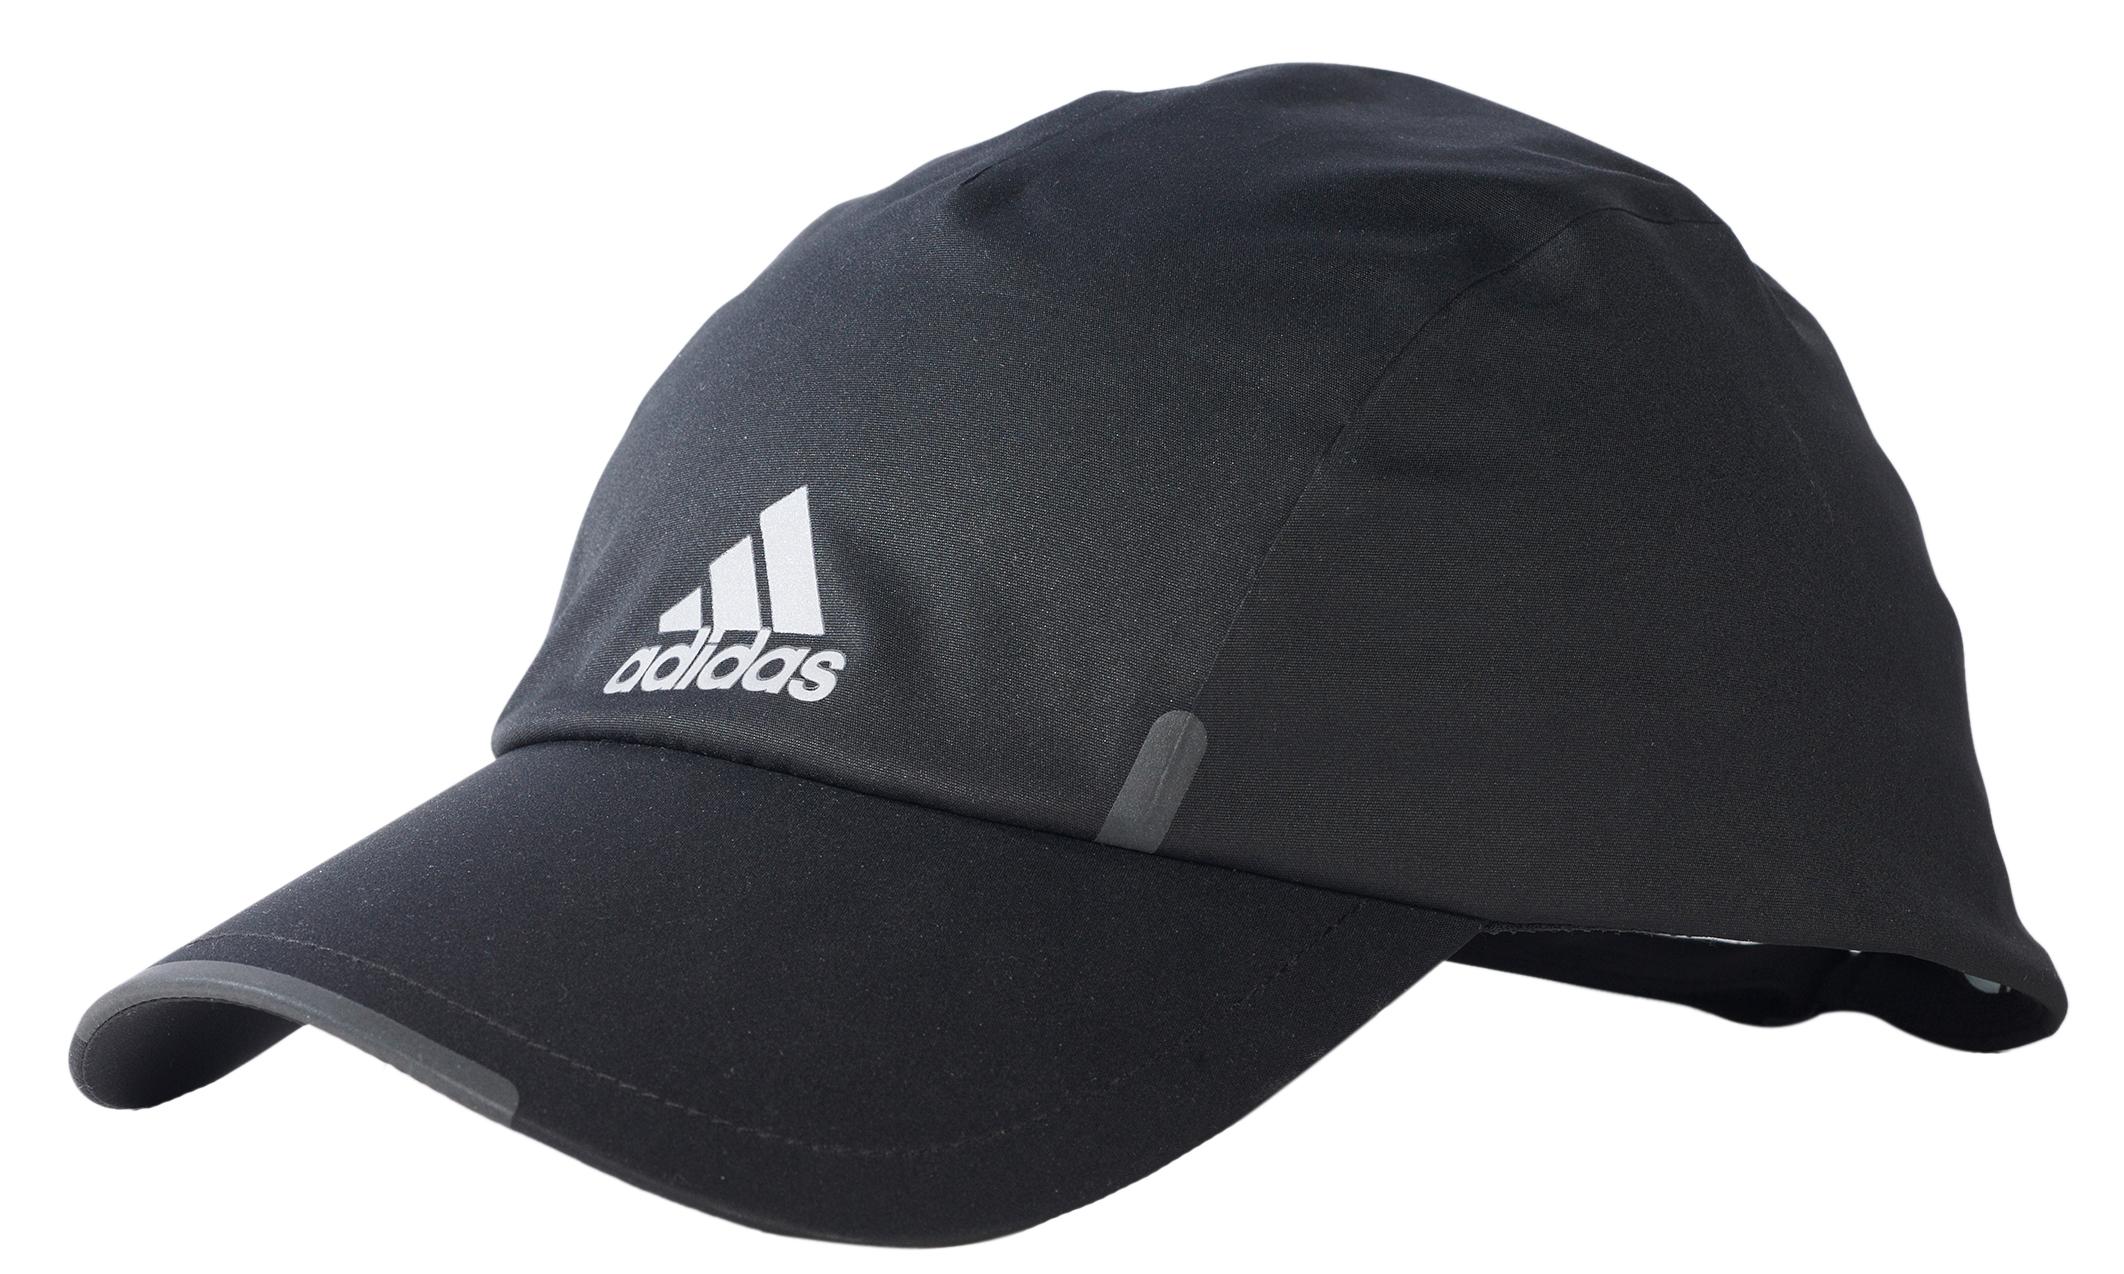 Adidas Run Climaproof Hat - Men s b9437d4e1765